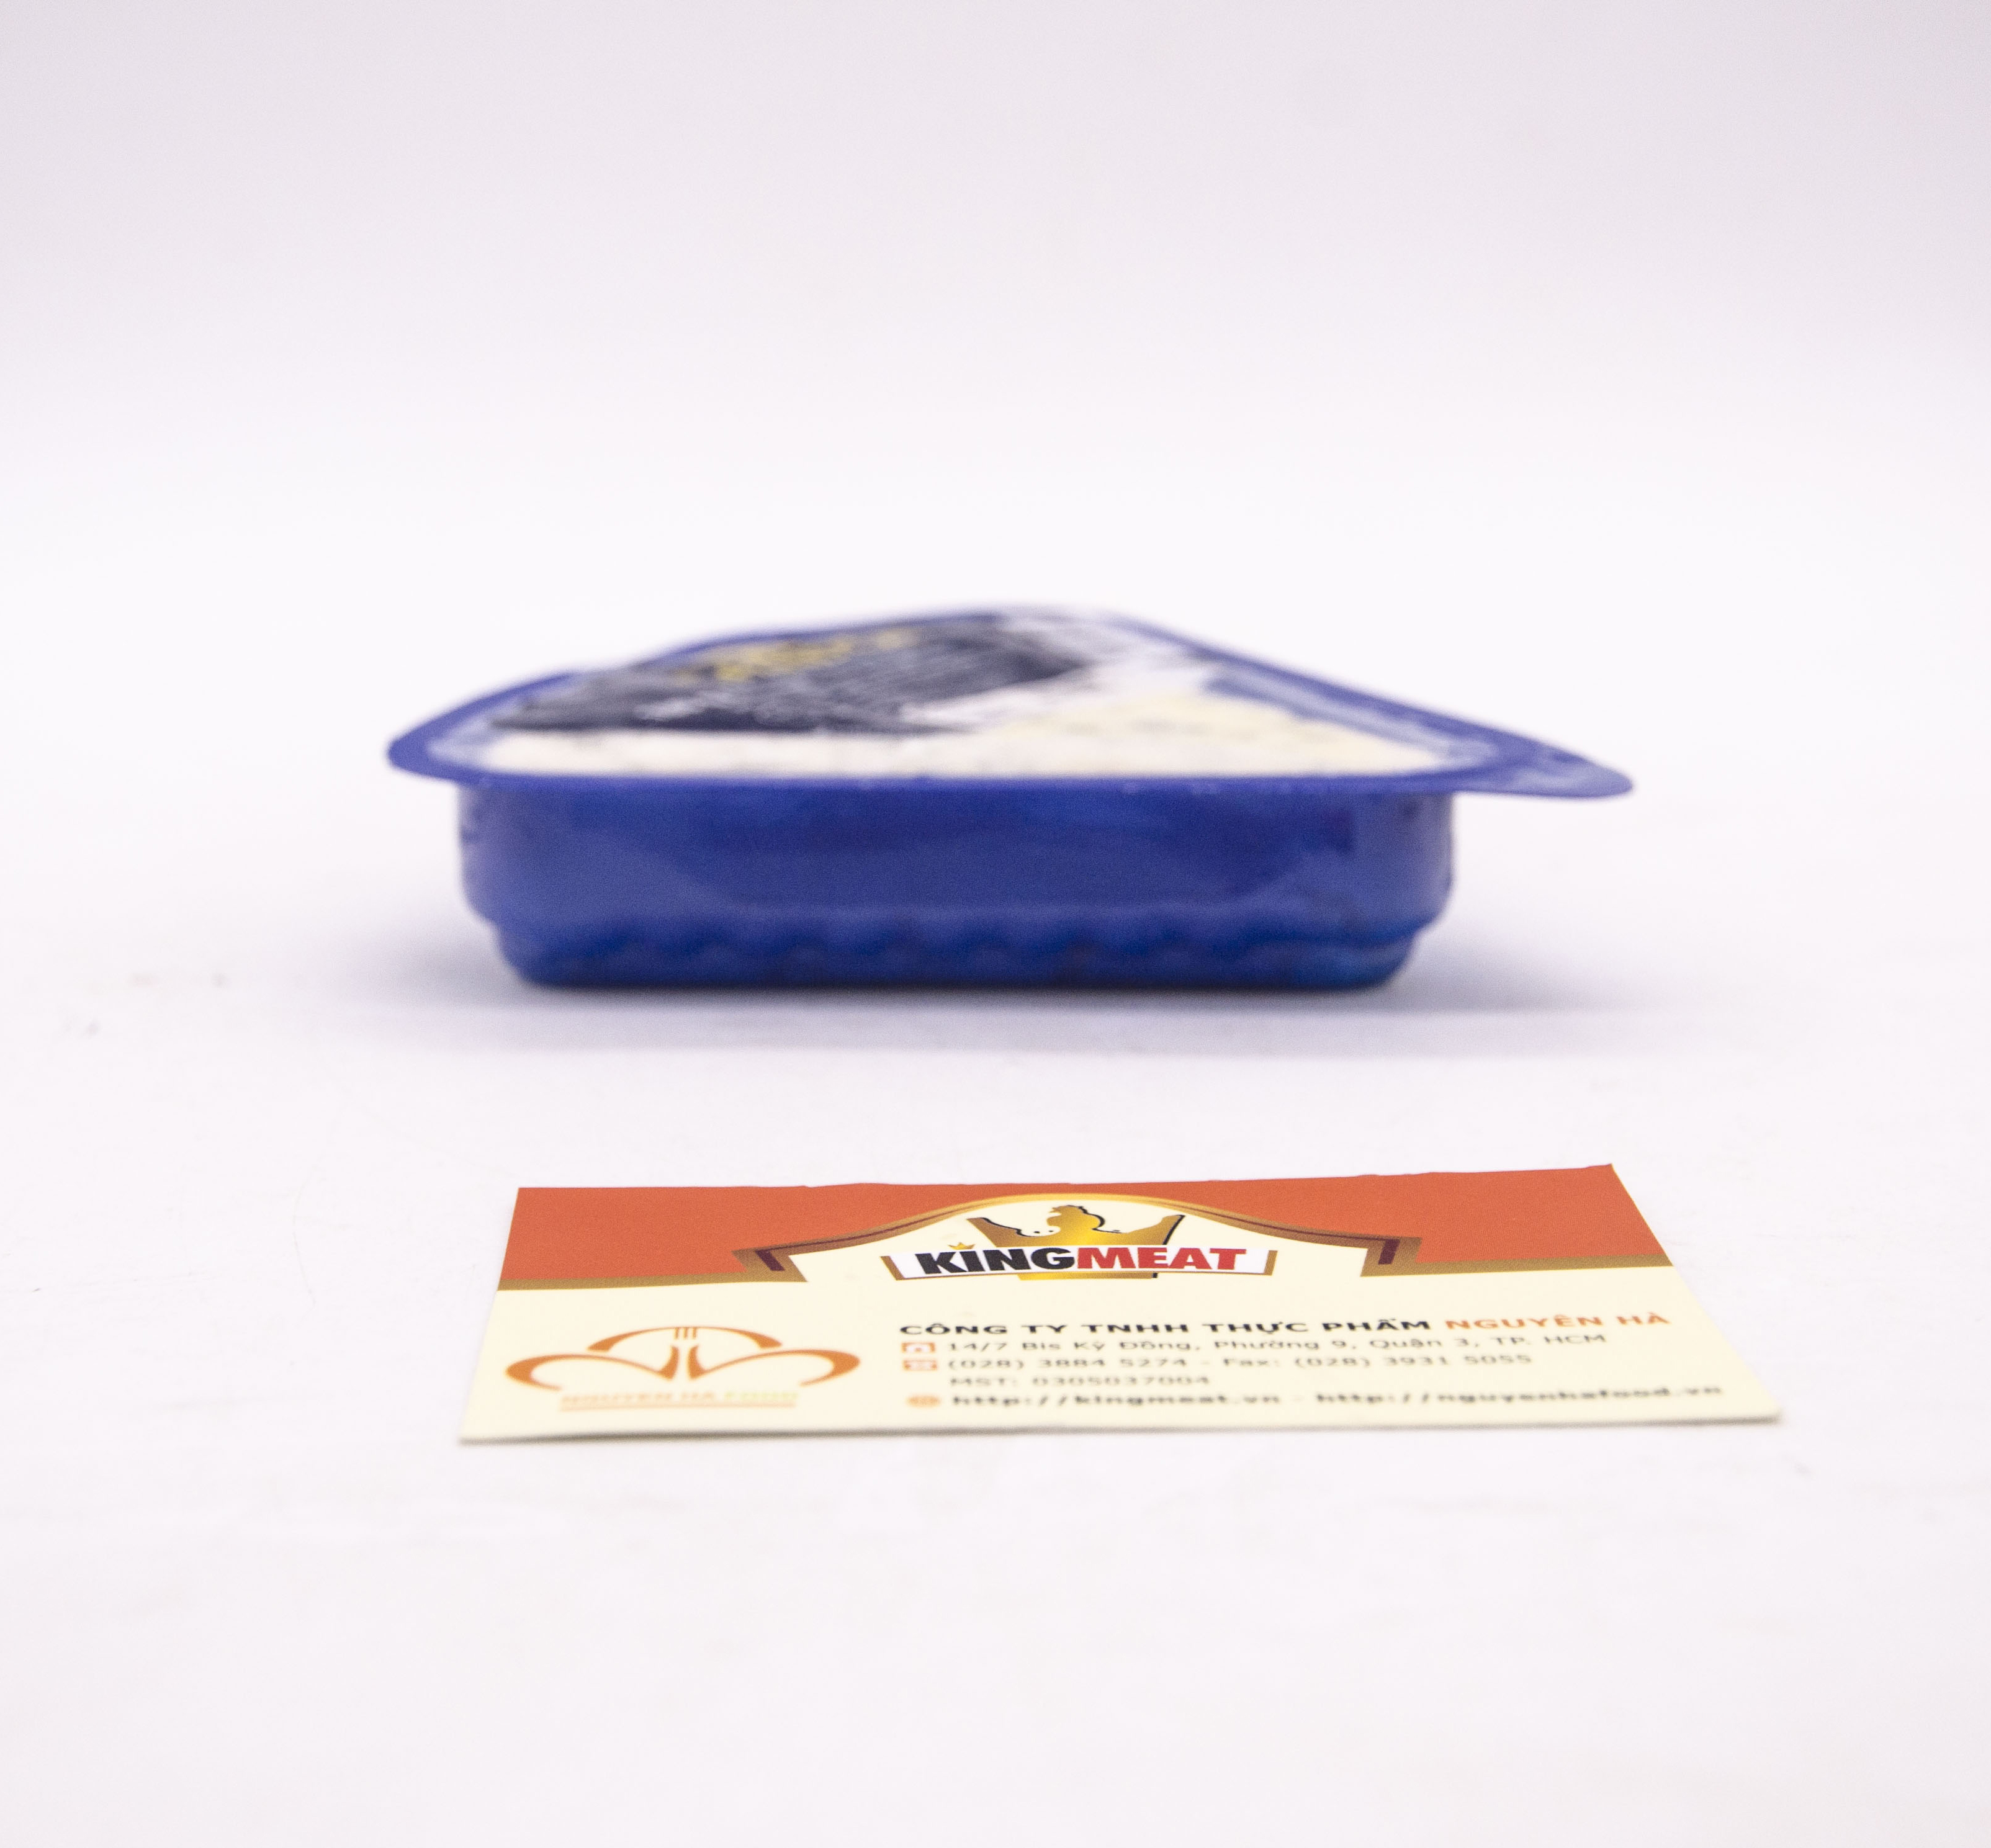 pho-mai-xanh-grand-or-100gr-ban-tai-nguyen-ha-food